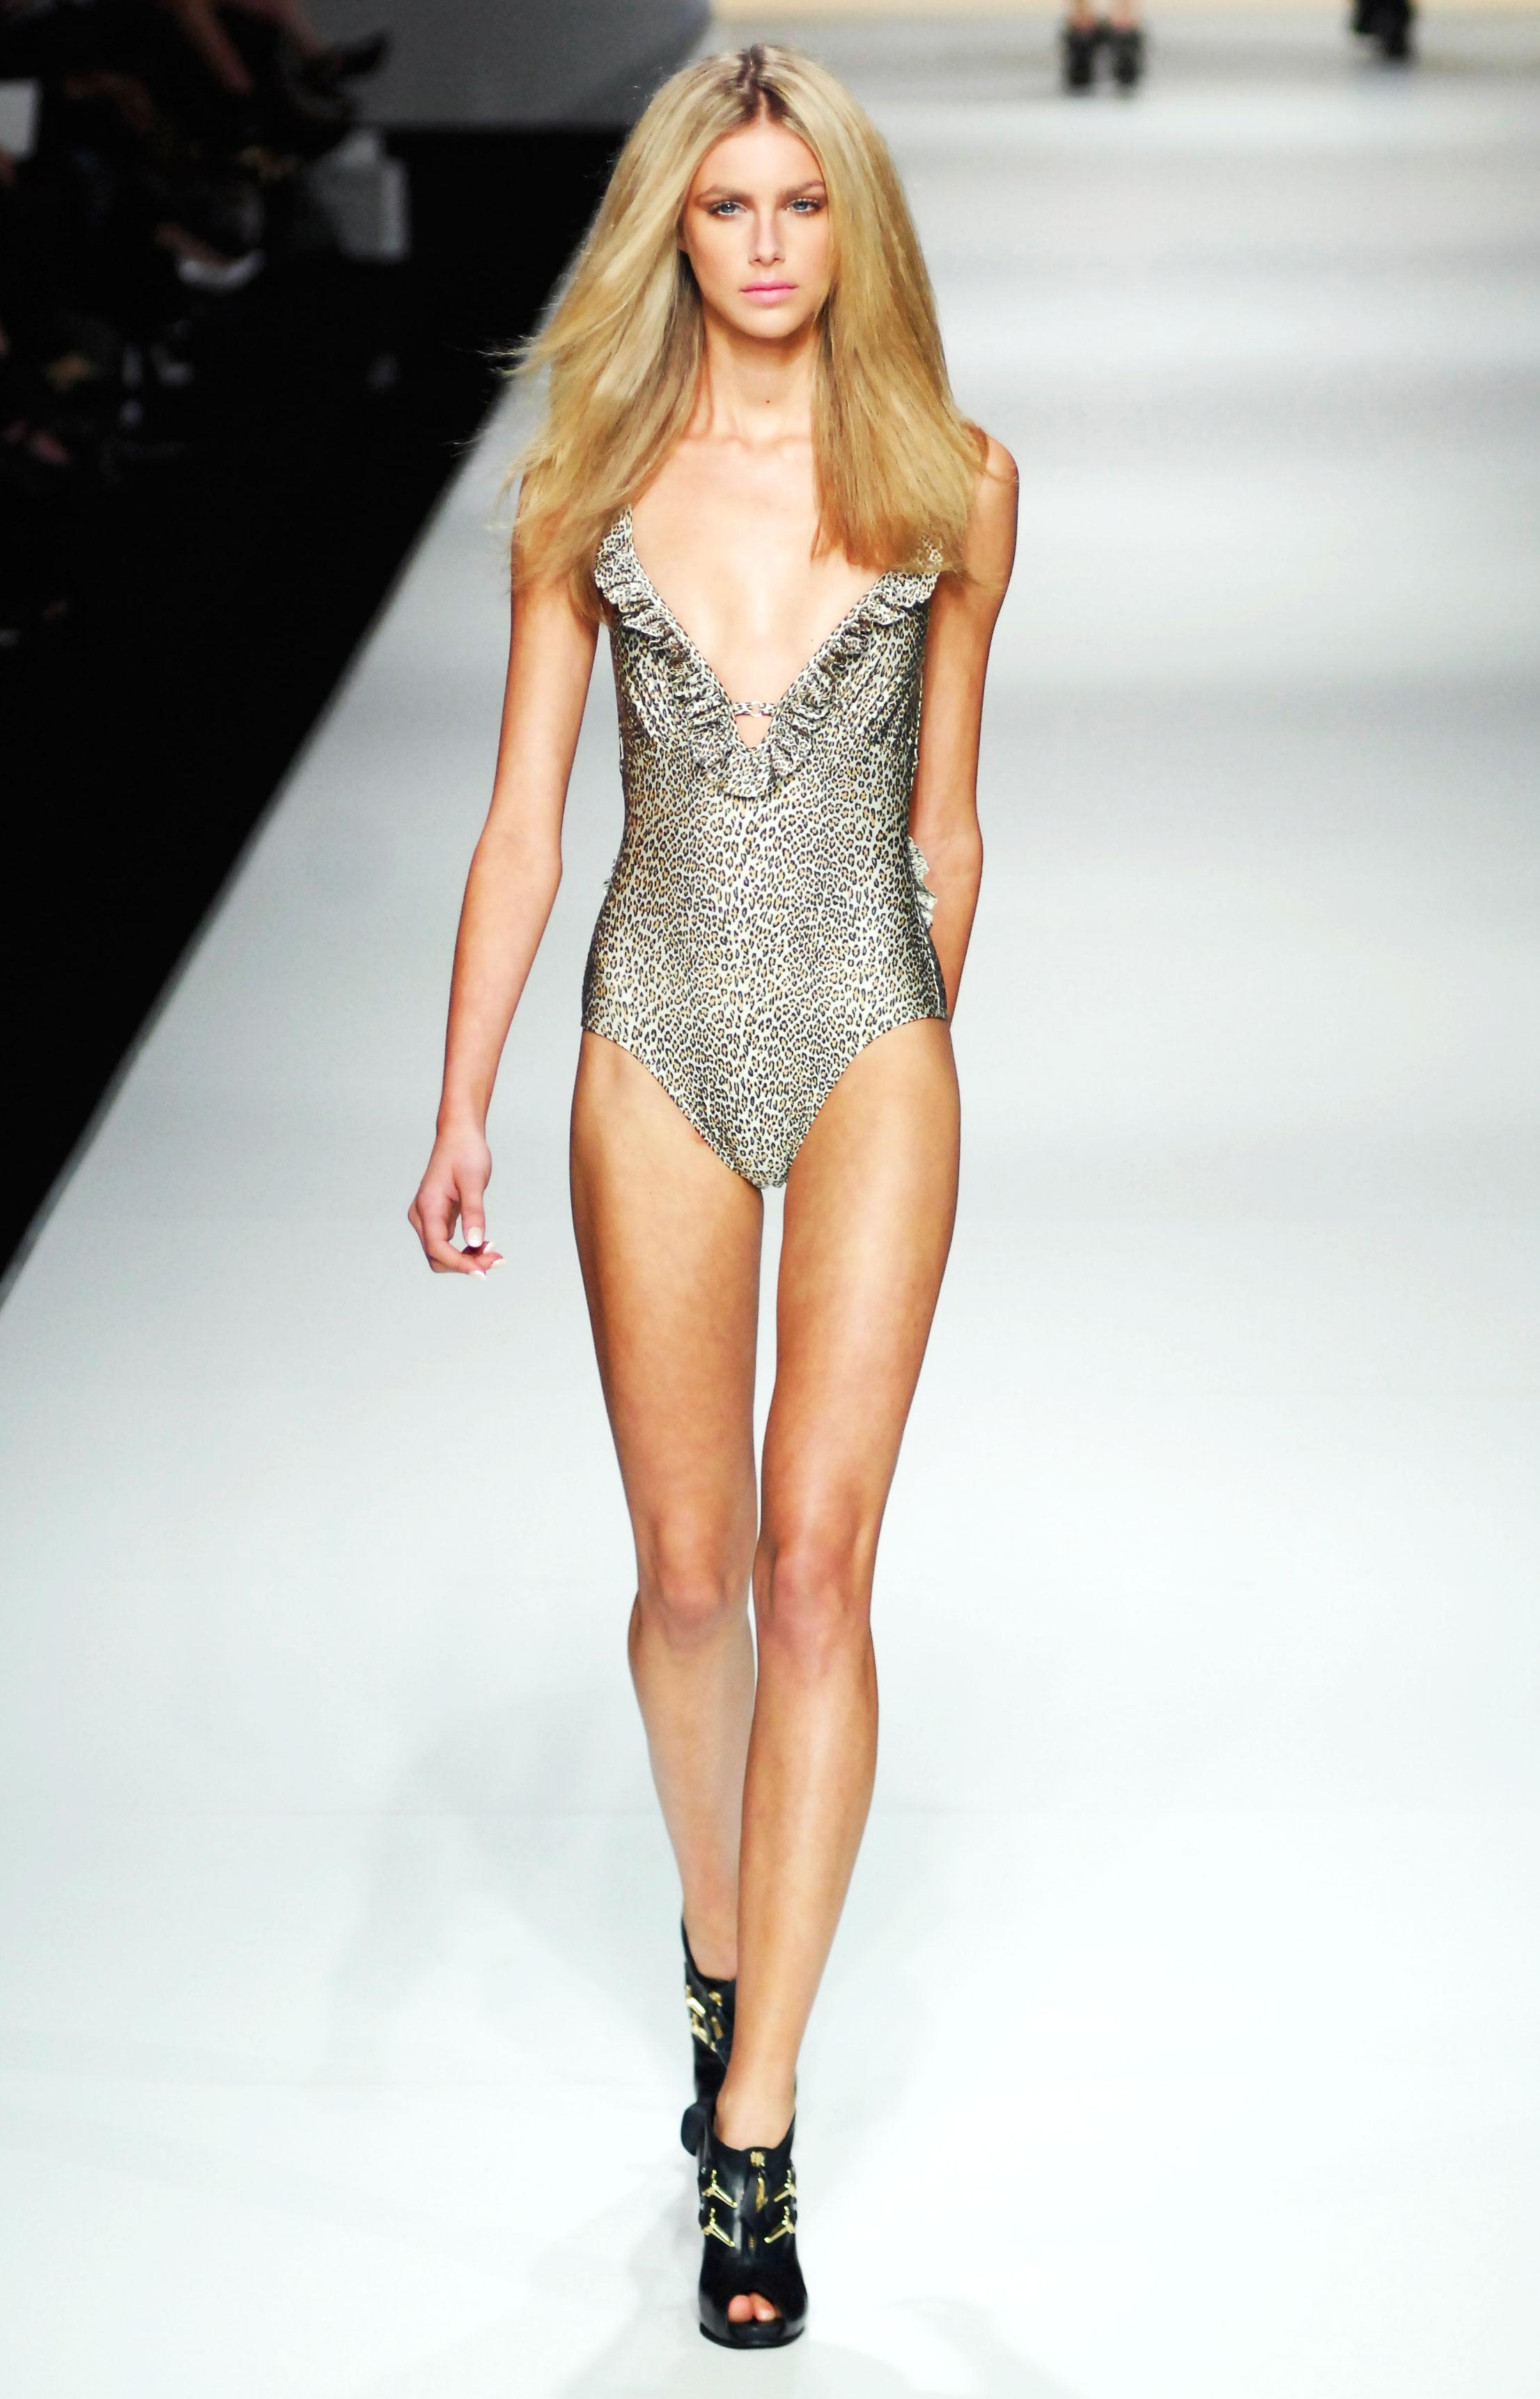 Size 0 Models Banned At Paris Fashion Week